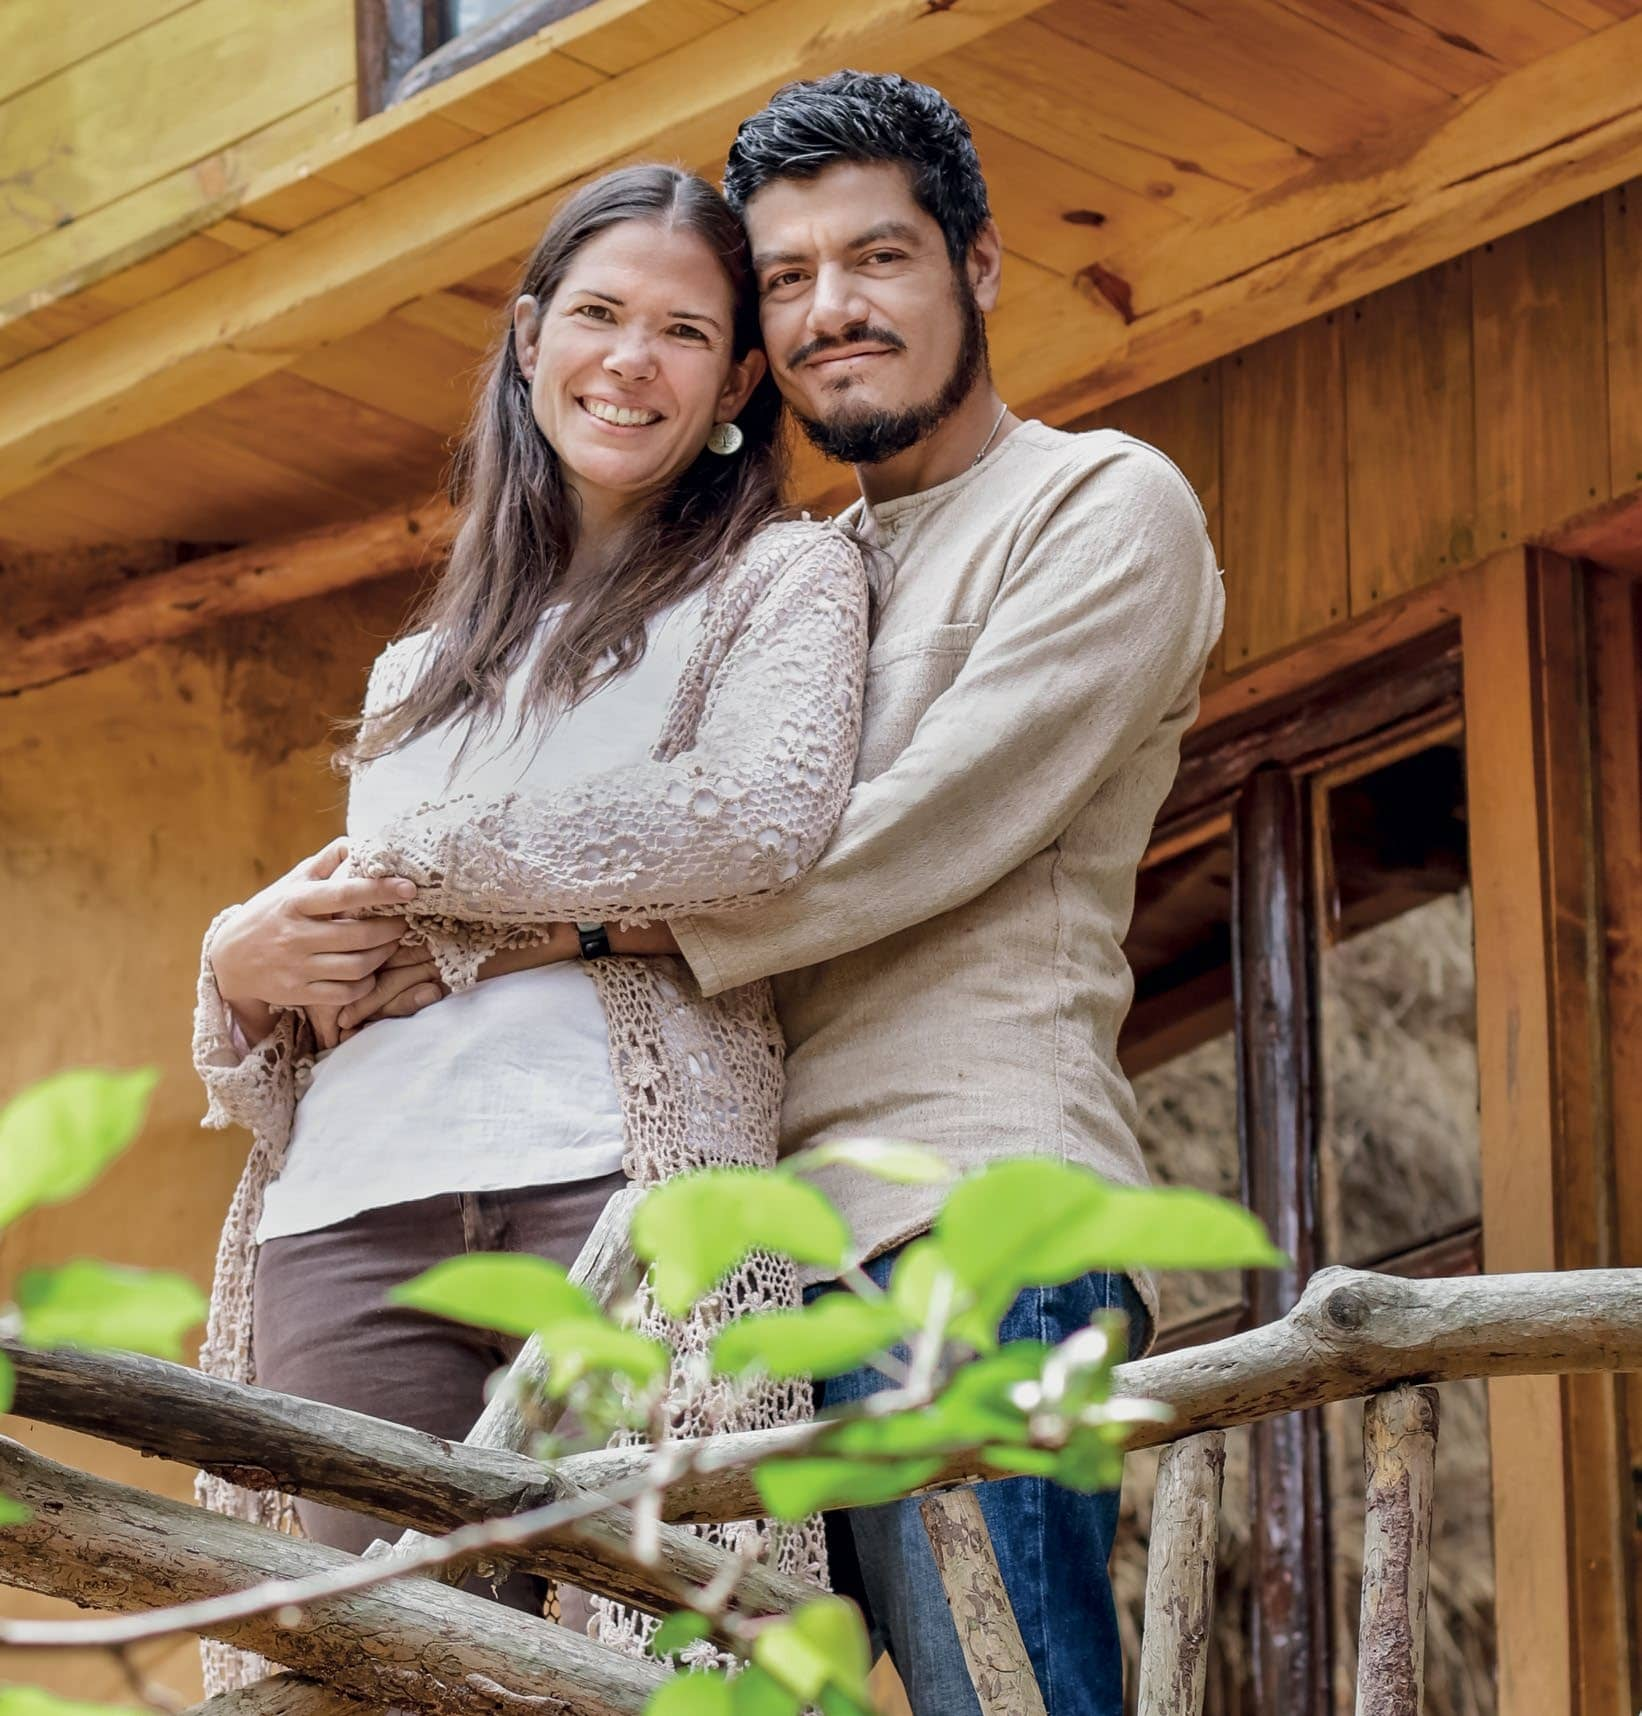 Un multinivel rentable desde la sierra de Oaxaca